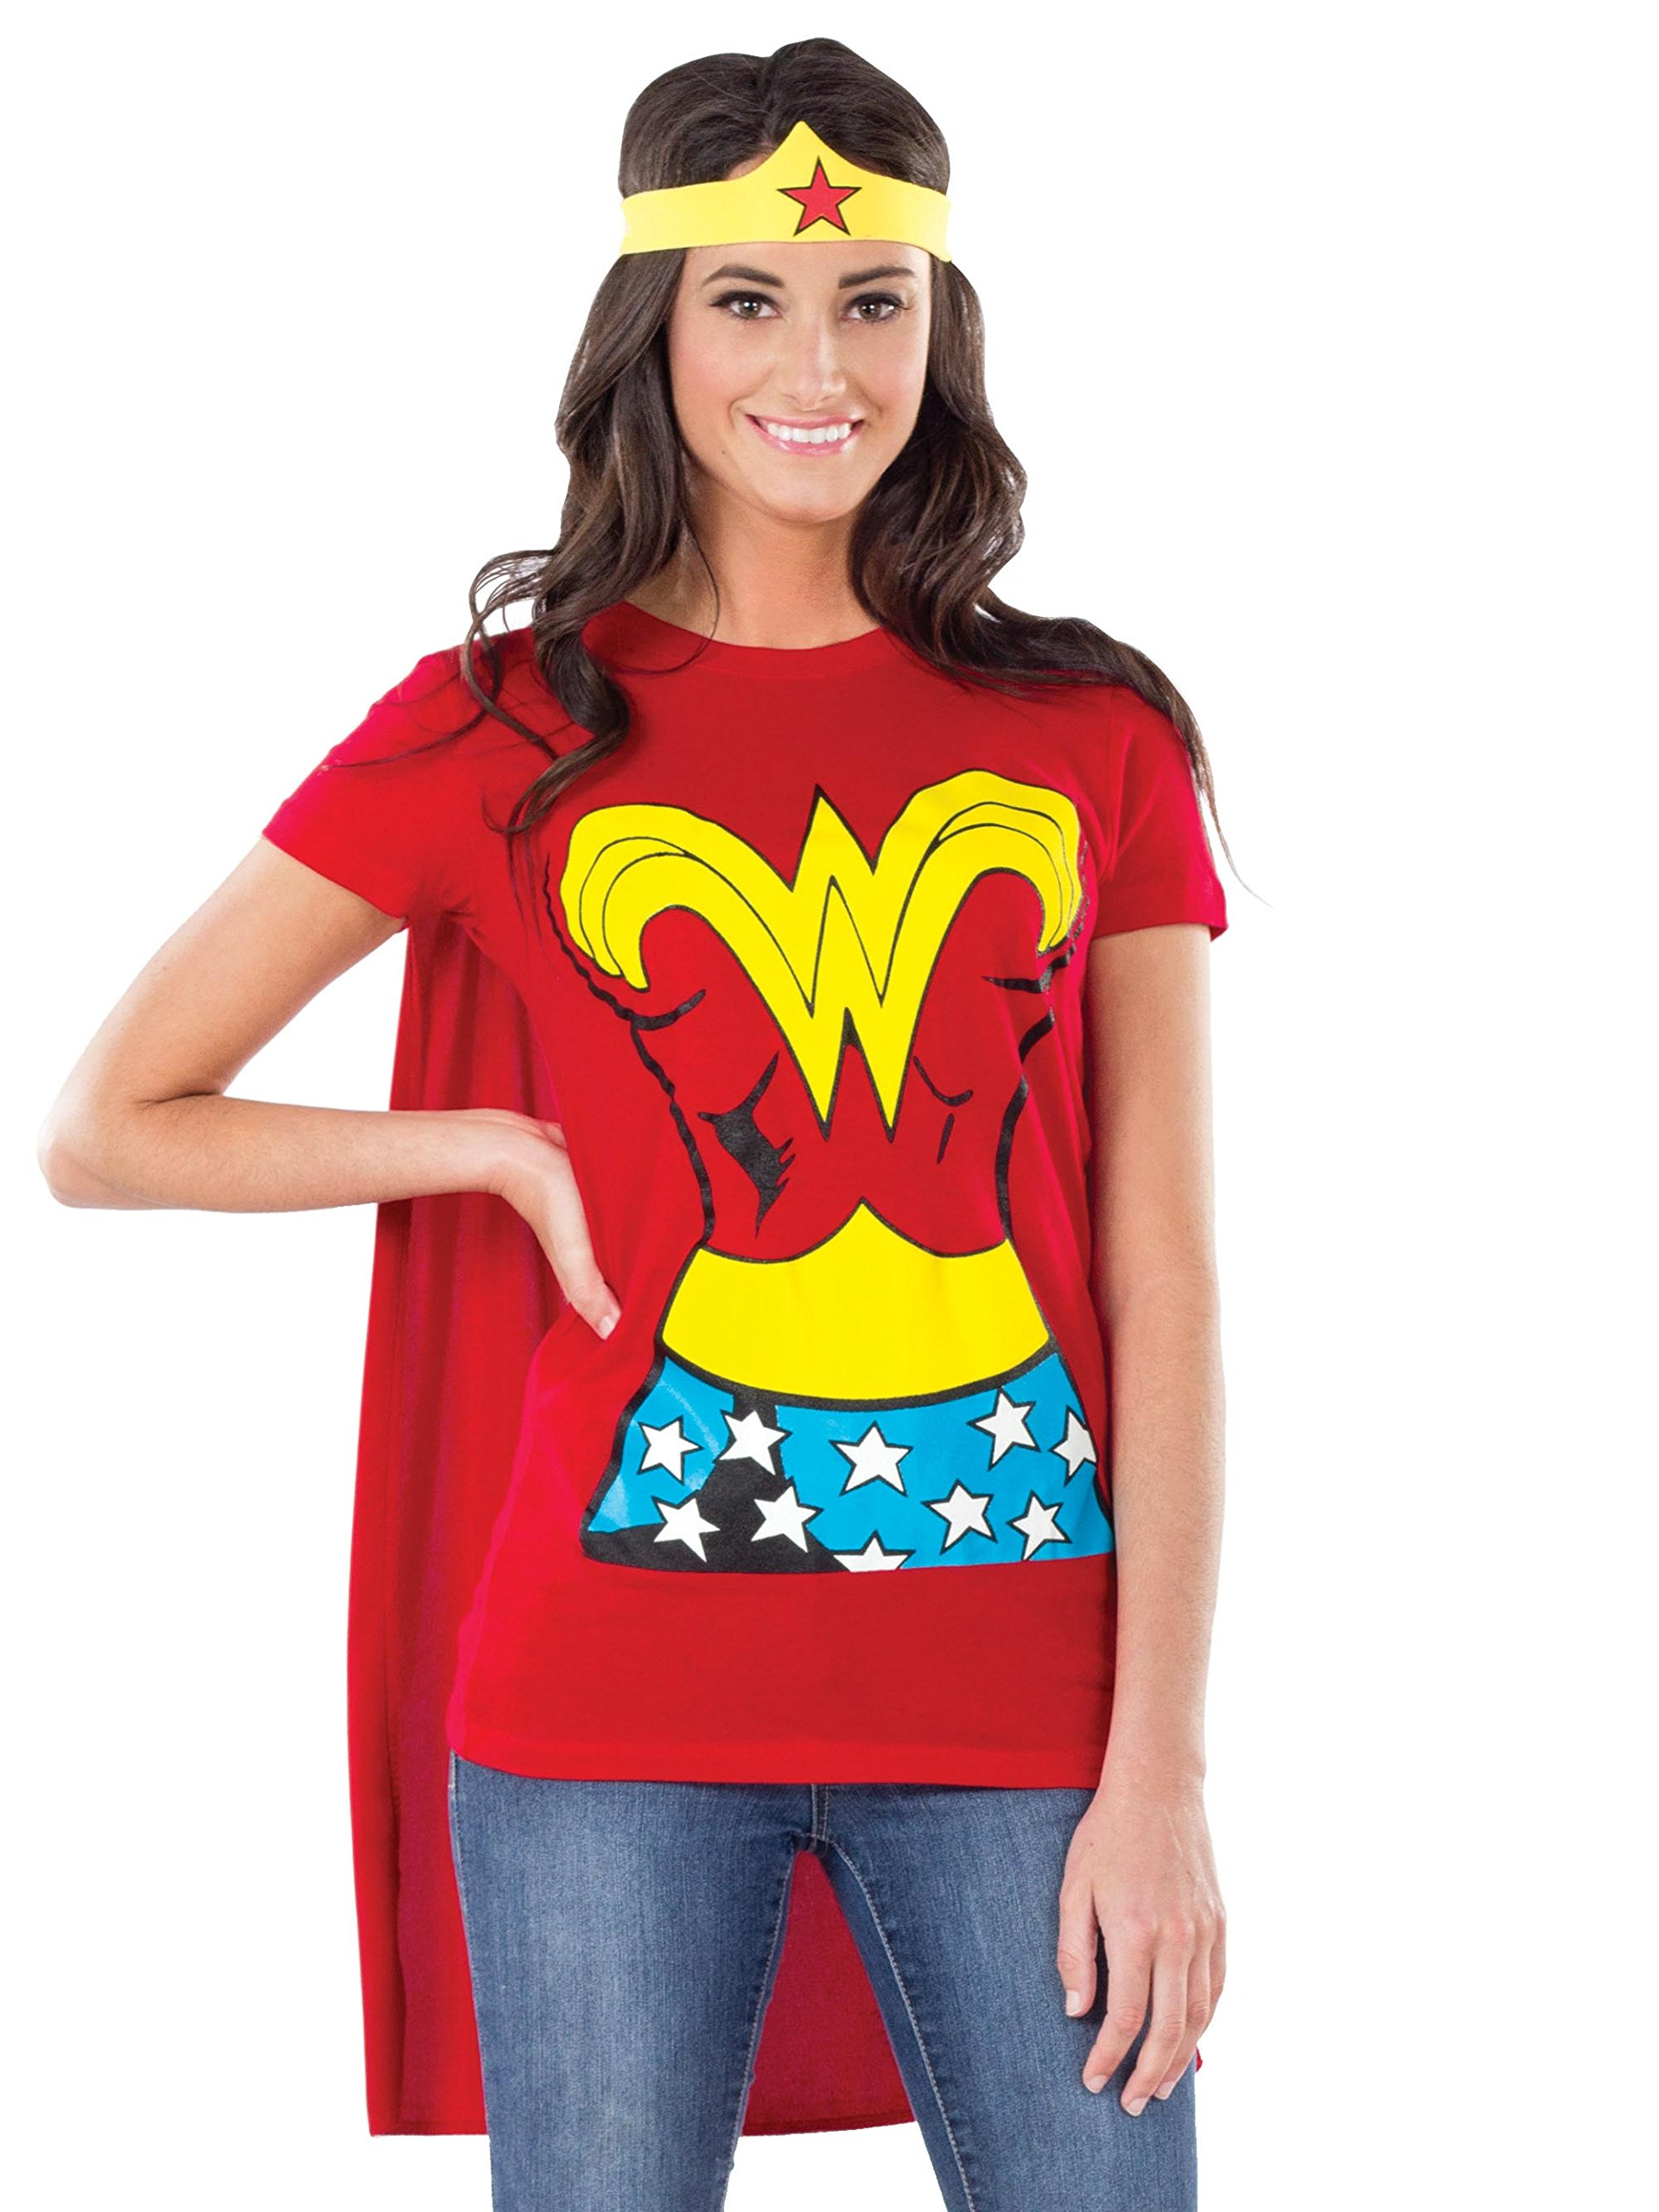 DC Comics Wonder Woman T-Shirt With Cape And Headband, Red, Medium Costume